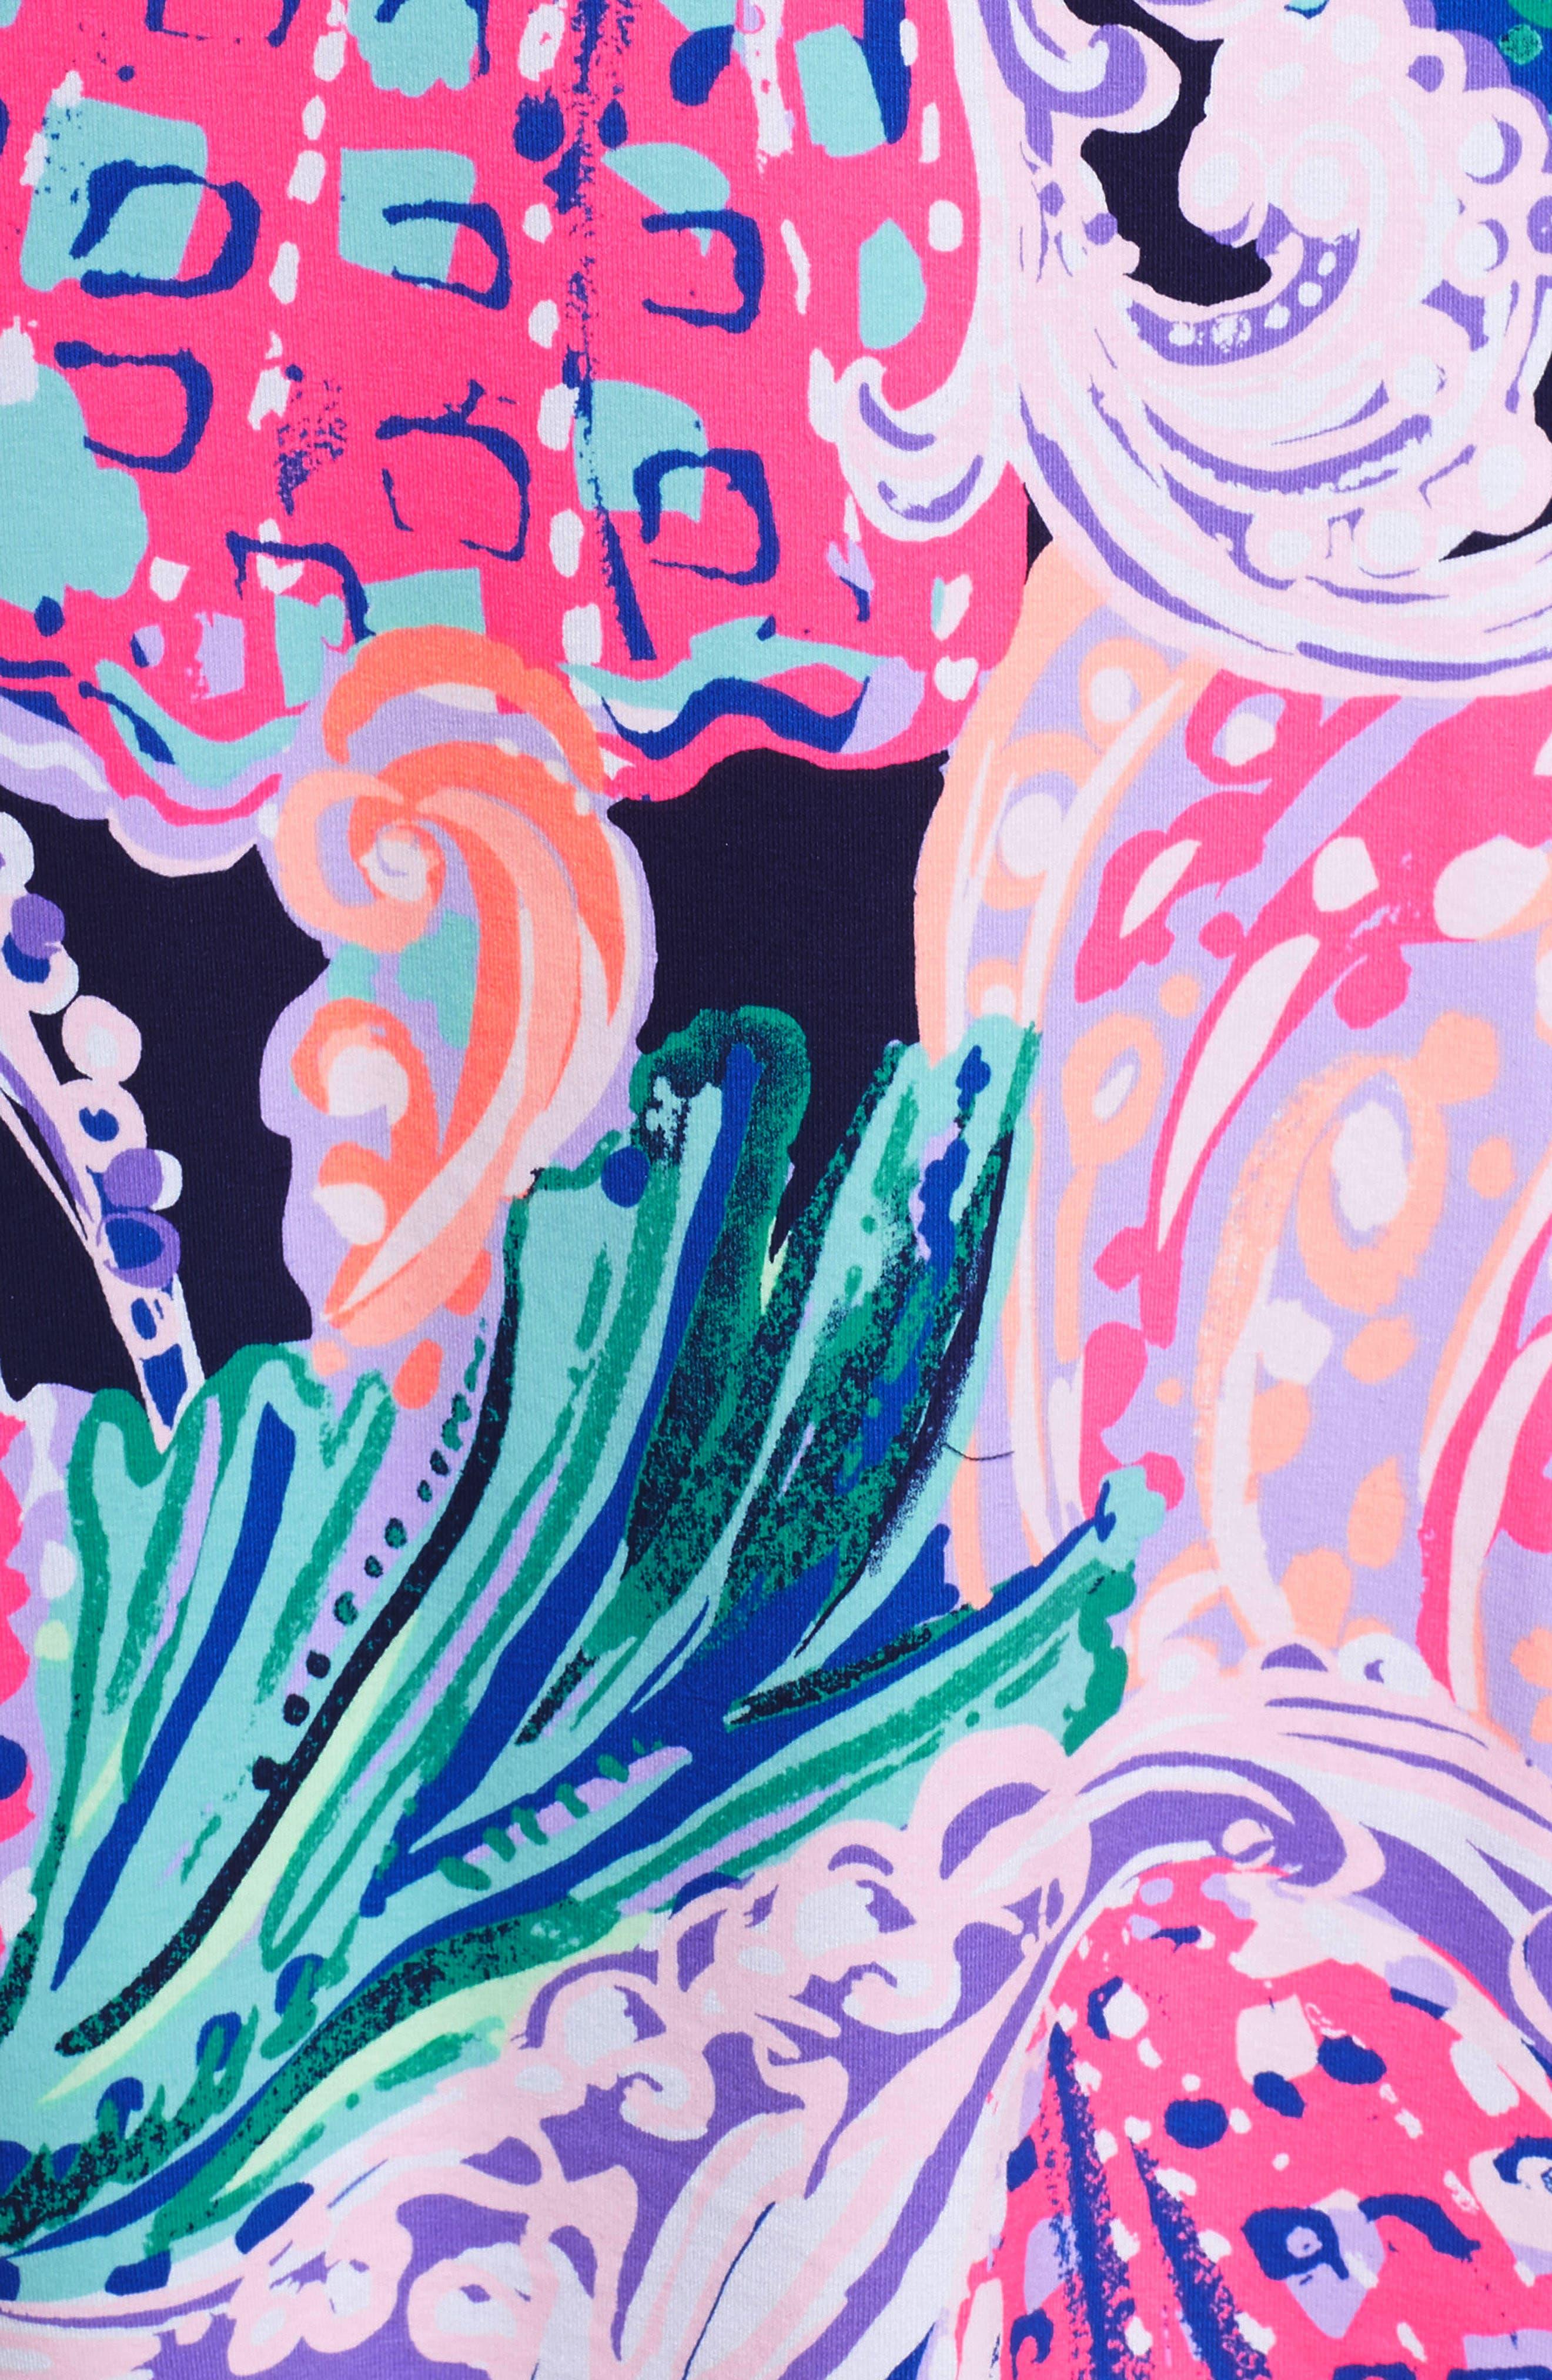 Trisha Off the Shoulder Dress,                             Alternate thumbnail 5, color,                             Multi All That She Wants